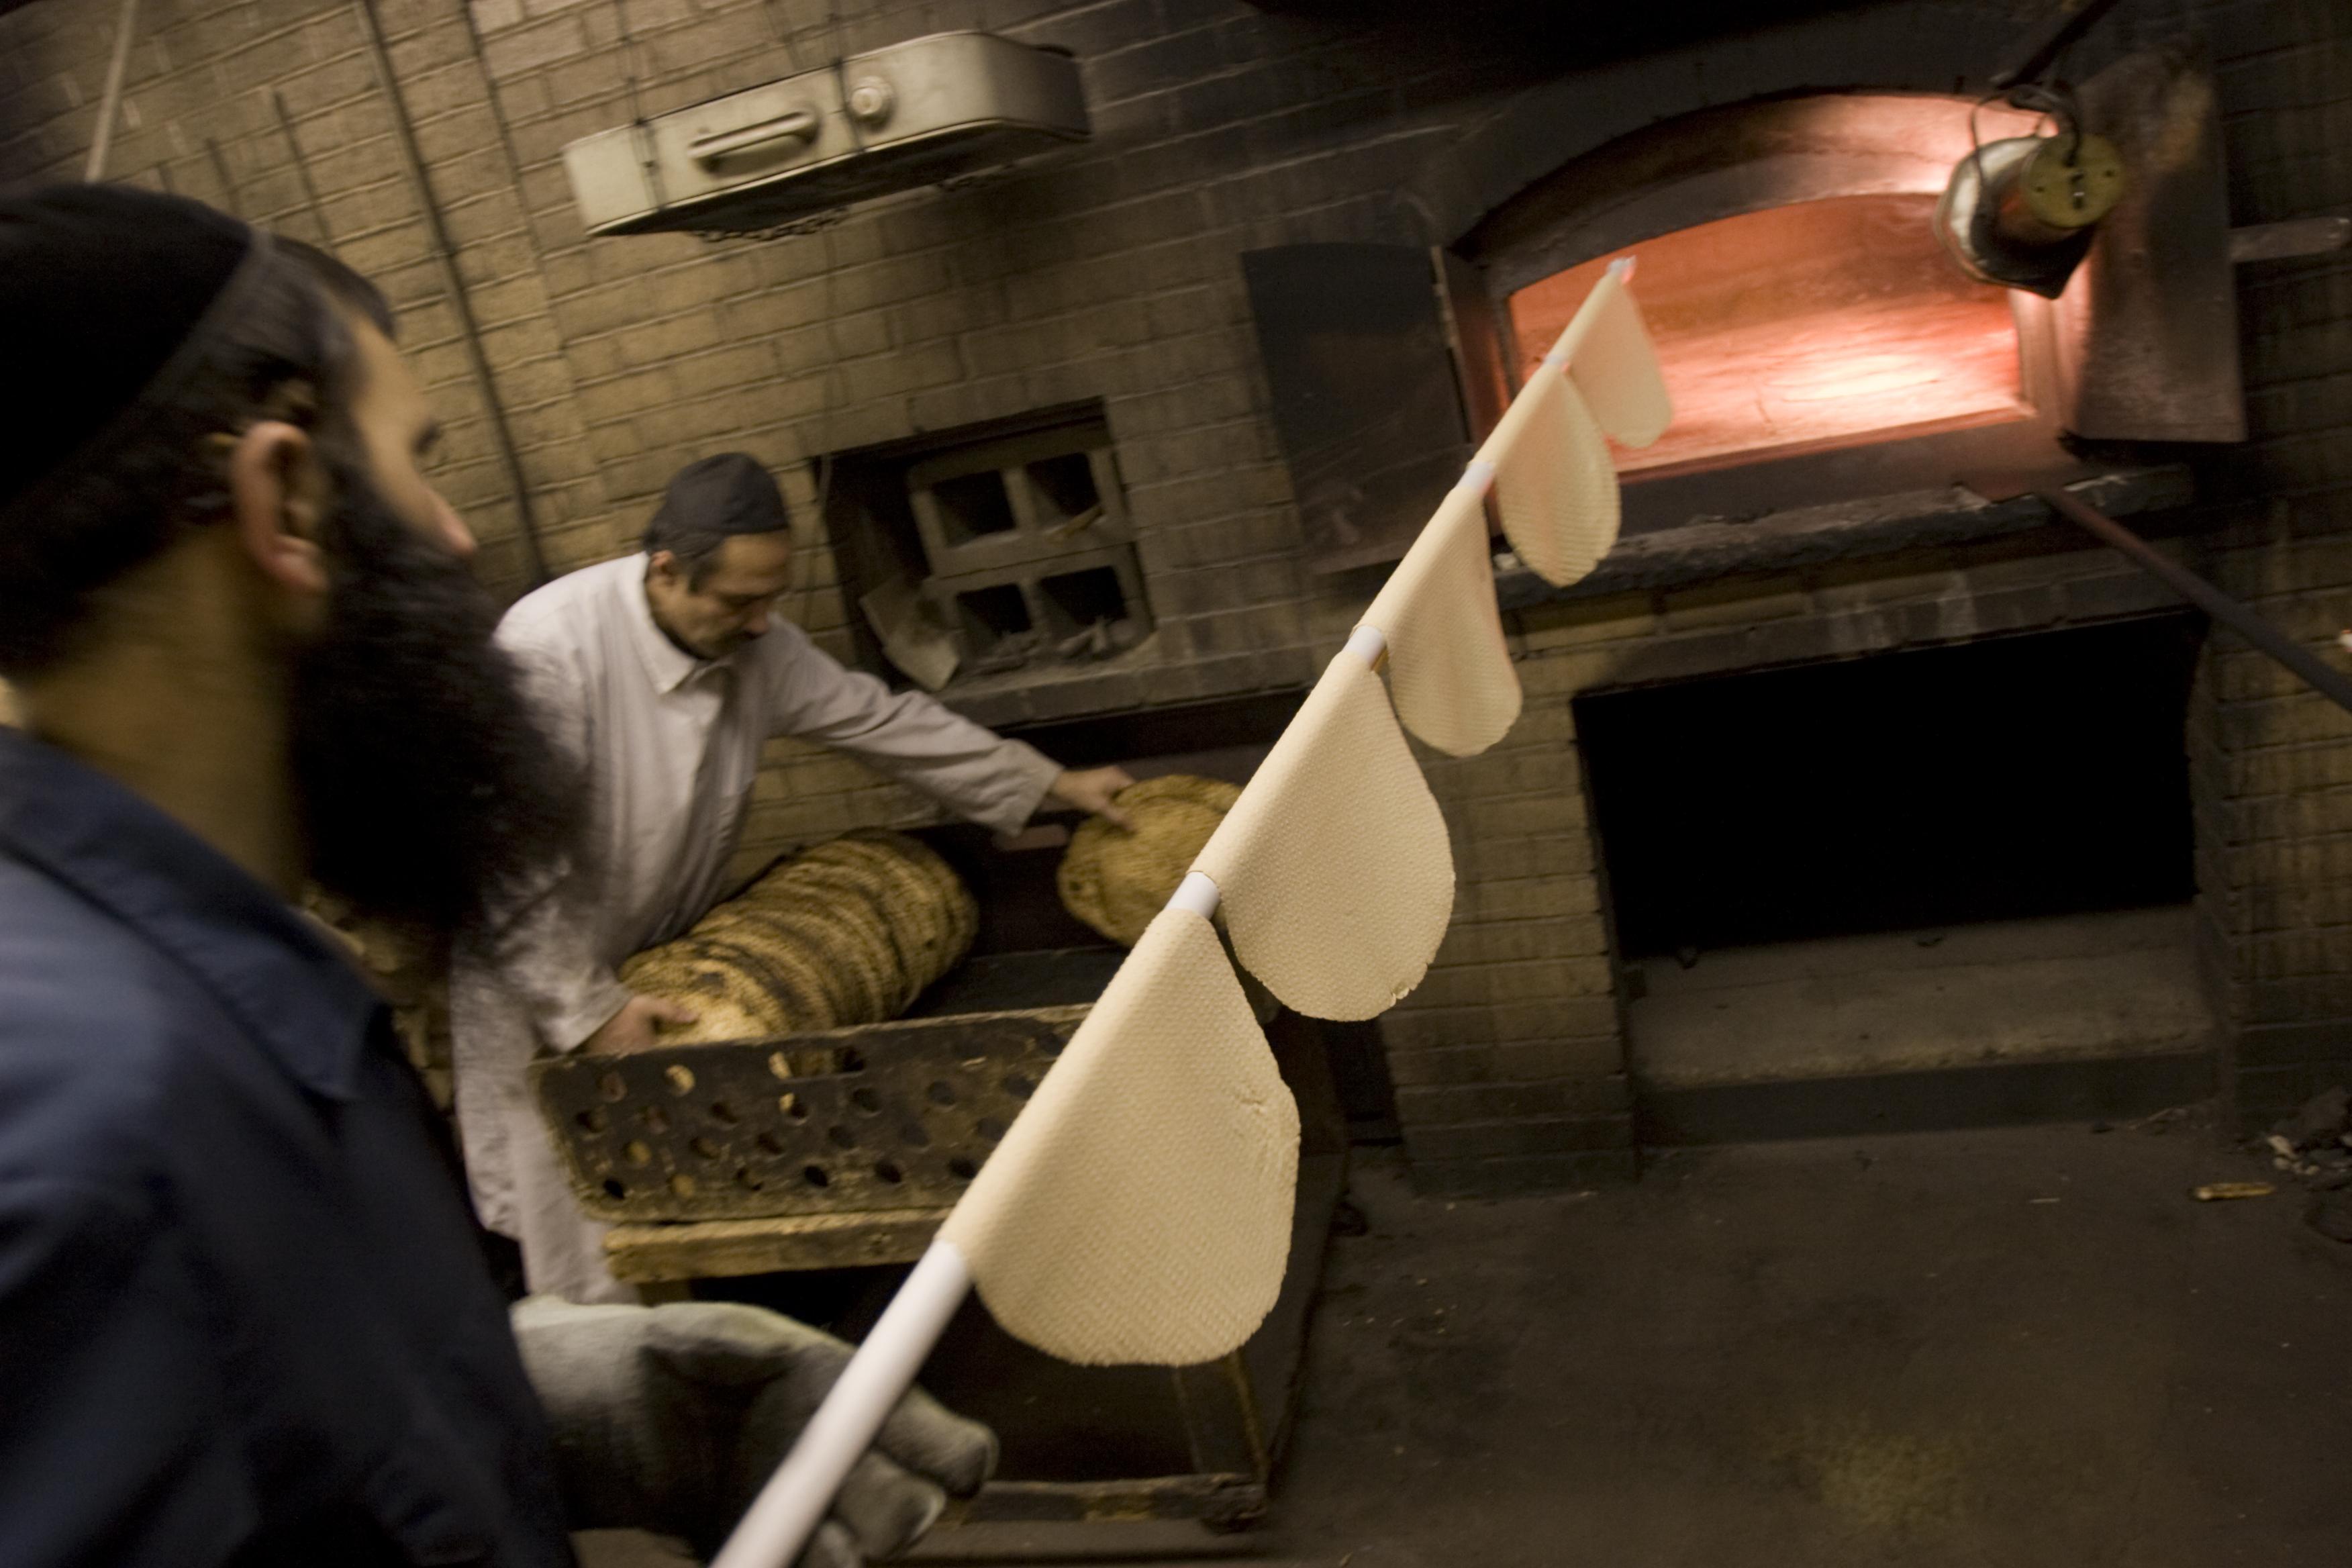 http://cdn.history.com/sites/2/2014/02/pupa-and-zehlem-matzoh-bakery.jpg